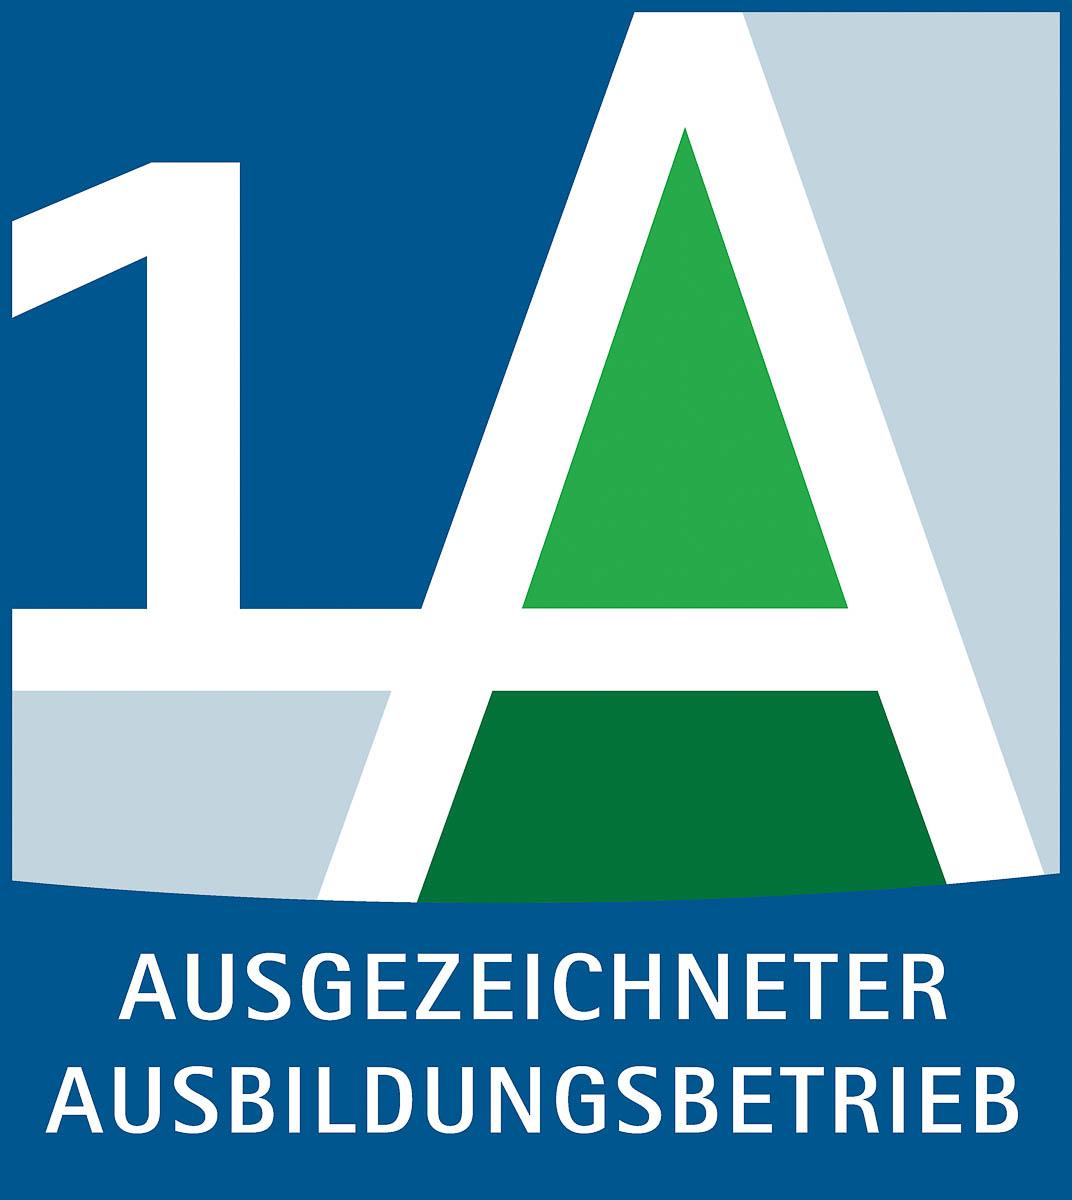 Karriere 1A Ausbilungsbetrieb Siegel helag-electronic Nagold